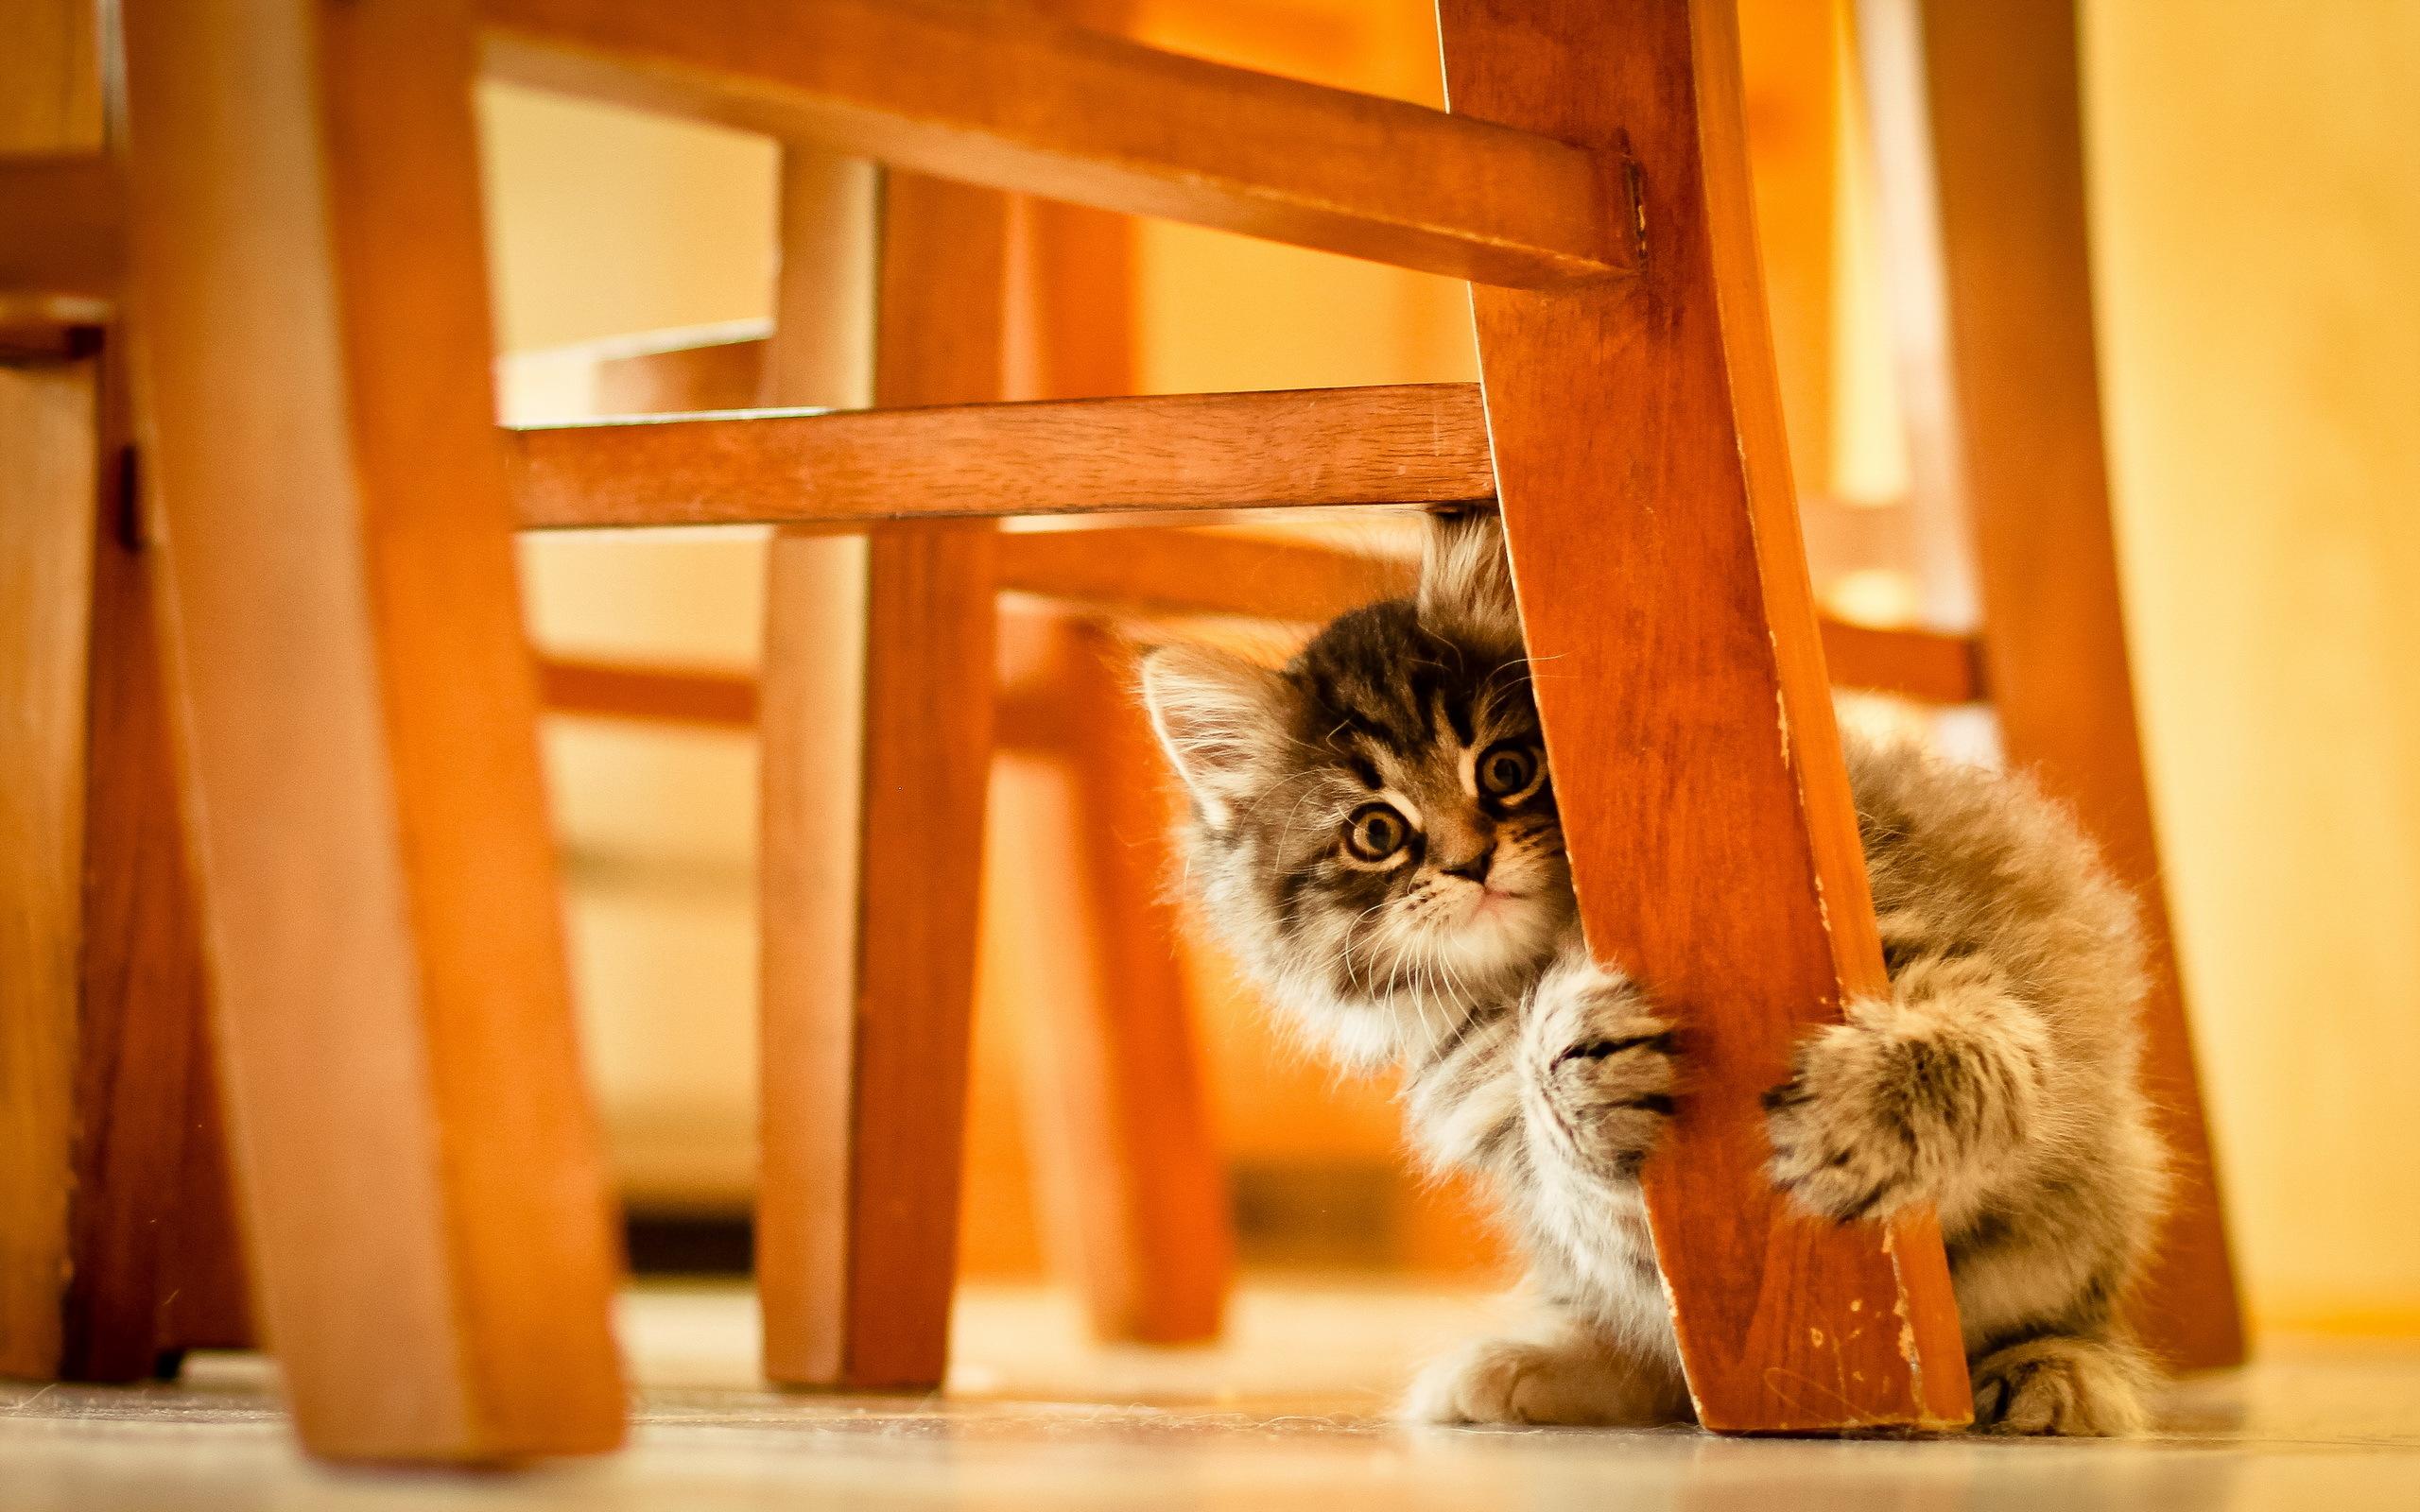 кот животное кресло морда  № 1943827 бесплатно